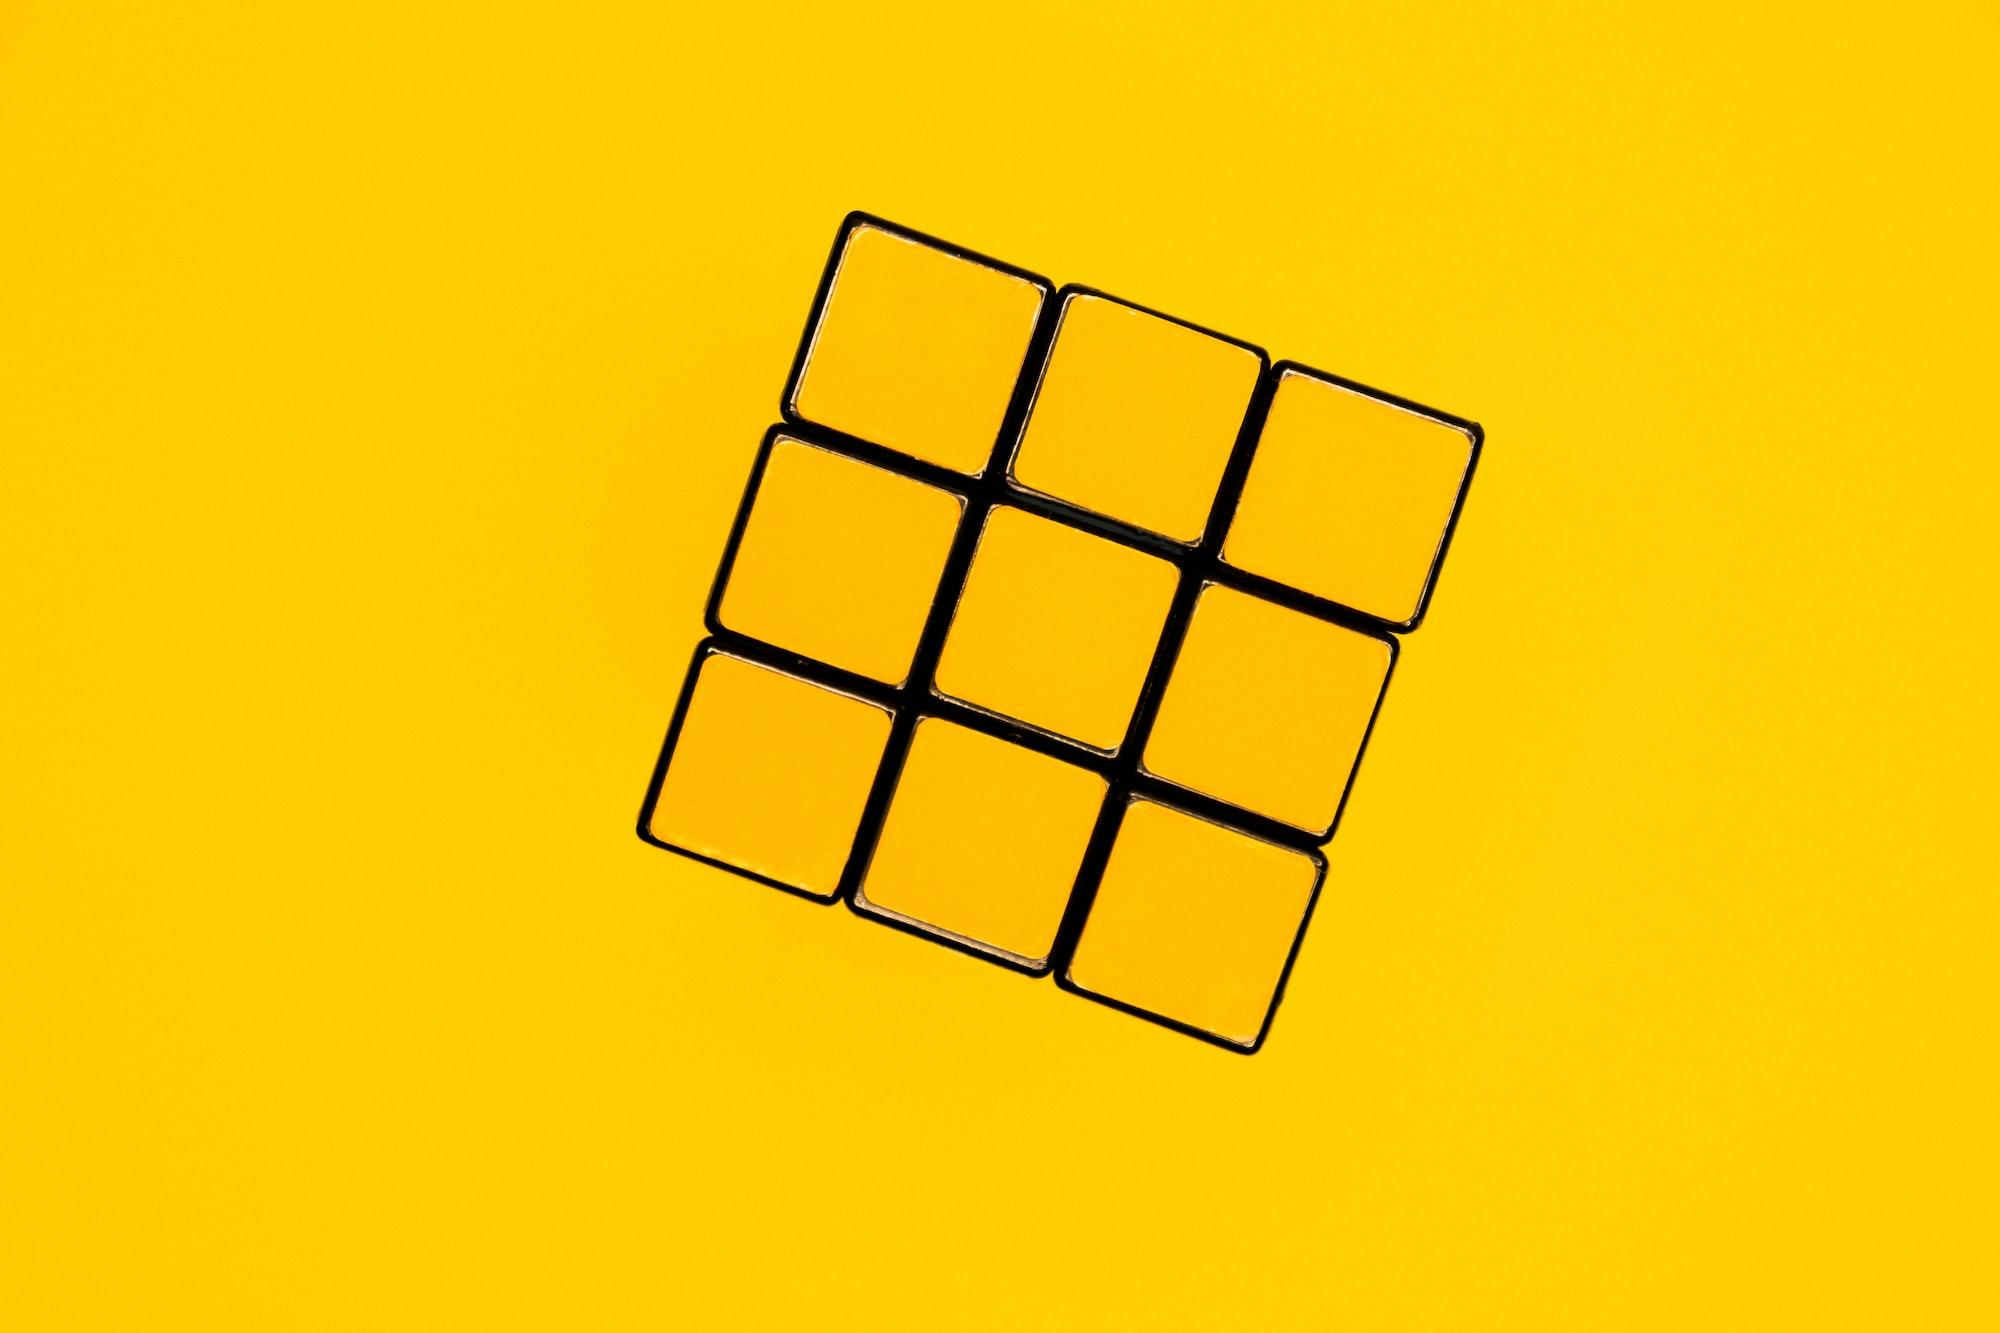 Still life Rubik cube   👋 Small donation -> huge appreciation paypal.me/DanieleFranchi 🙏🙏🙏